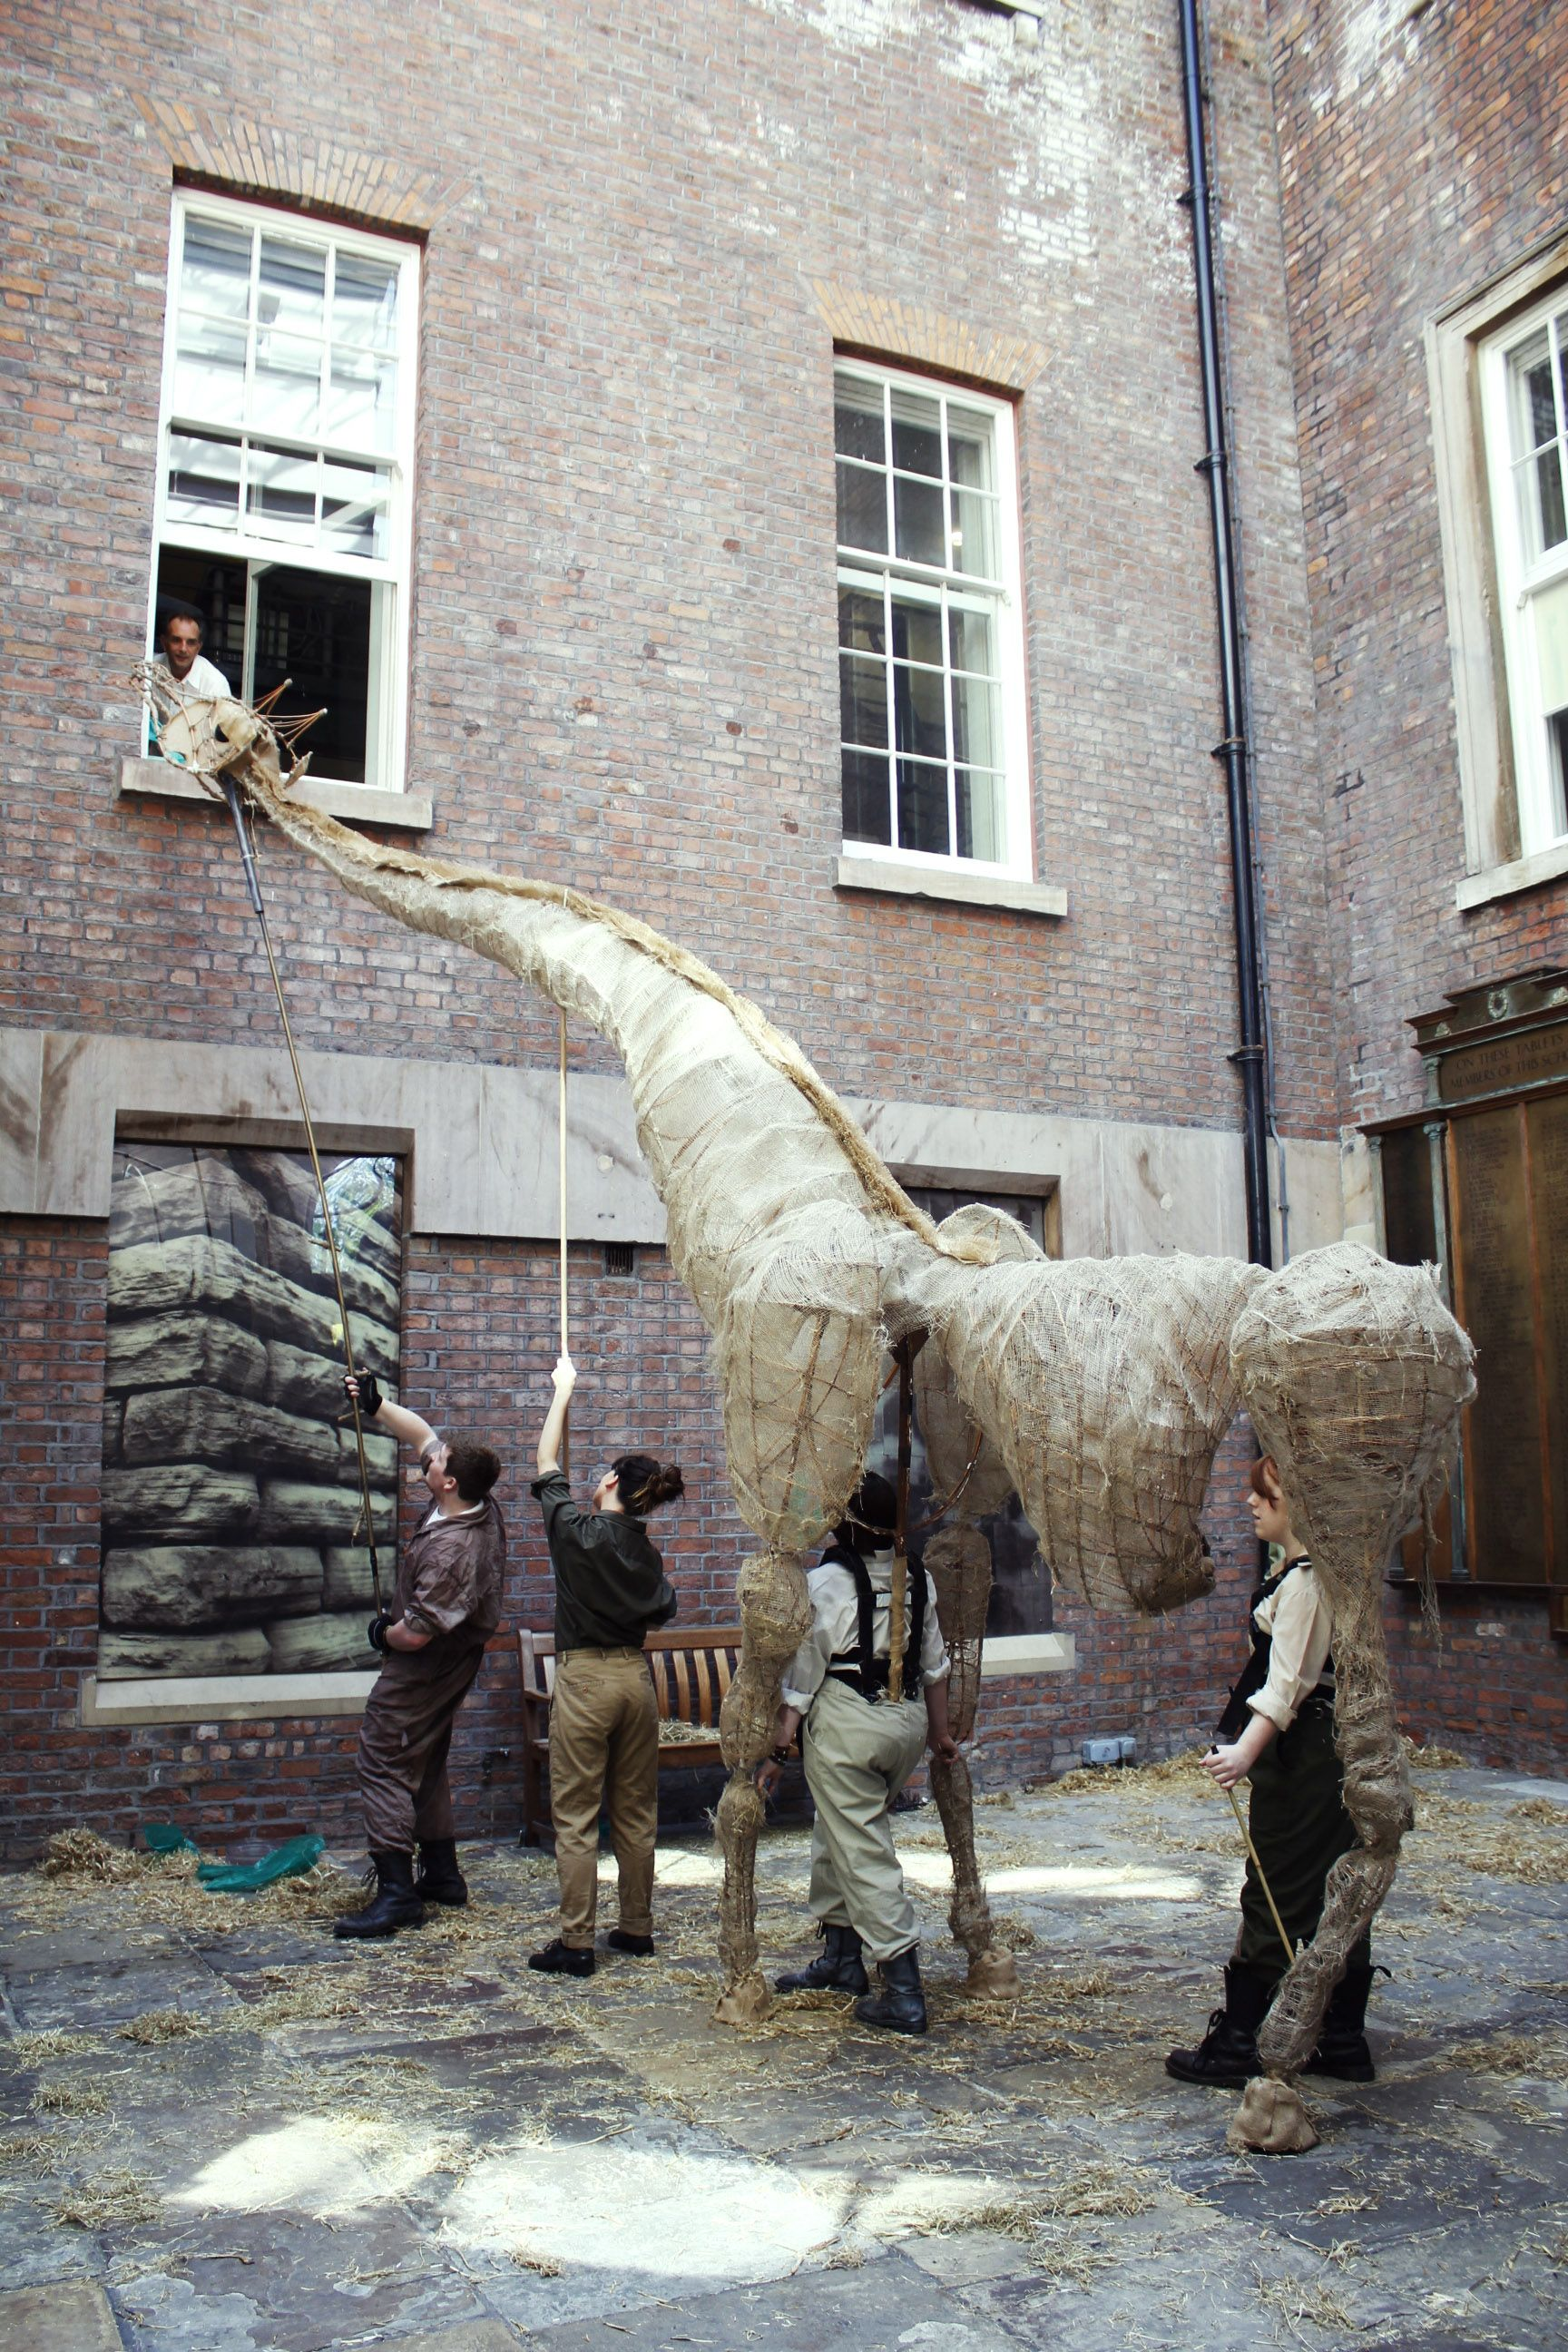 The Giant Giraffe - Mari Lotherington